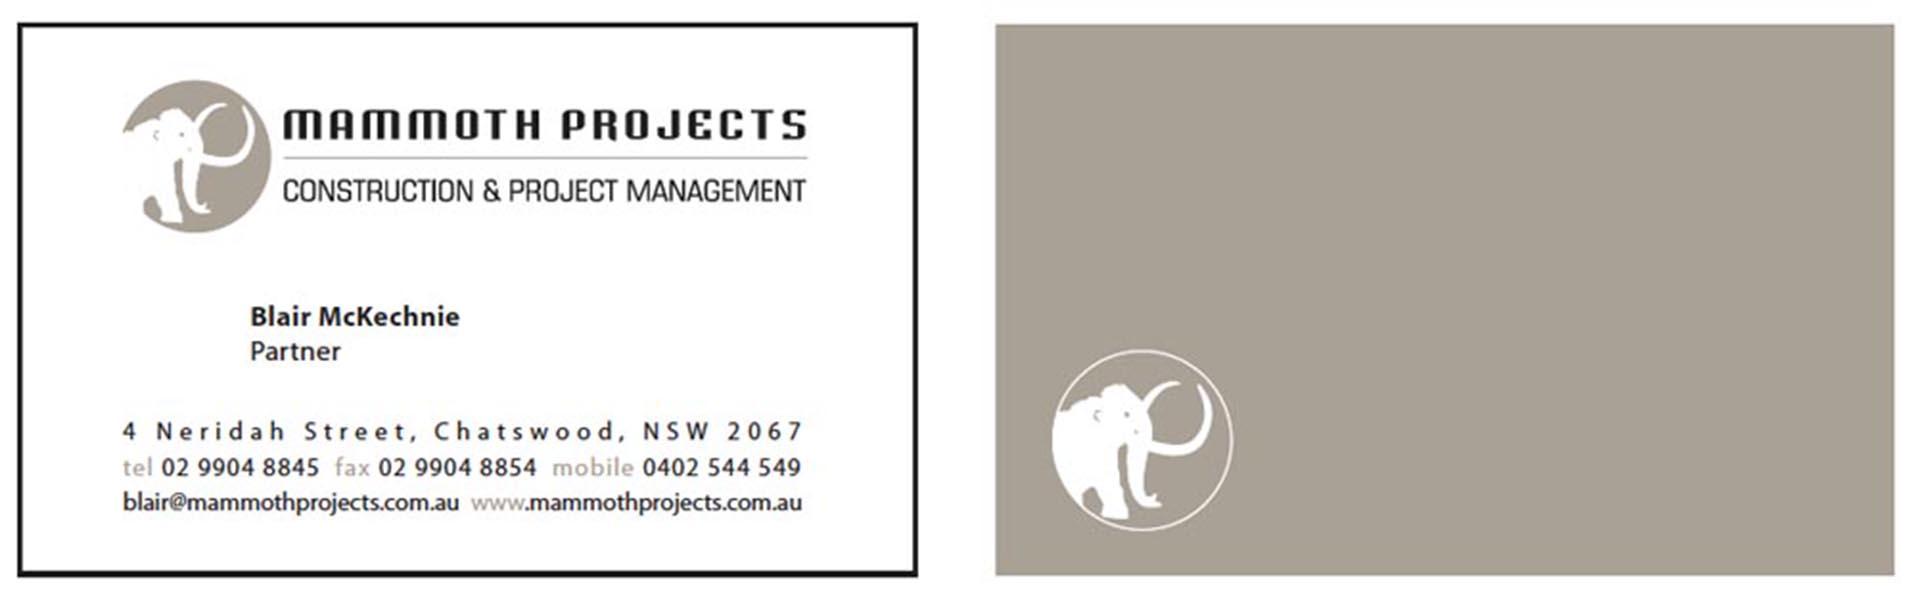 Mammoth BusinessCards